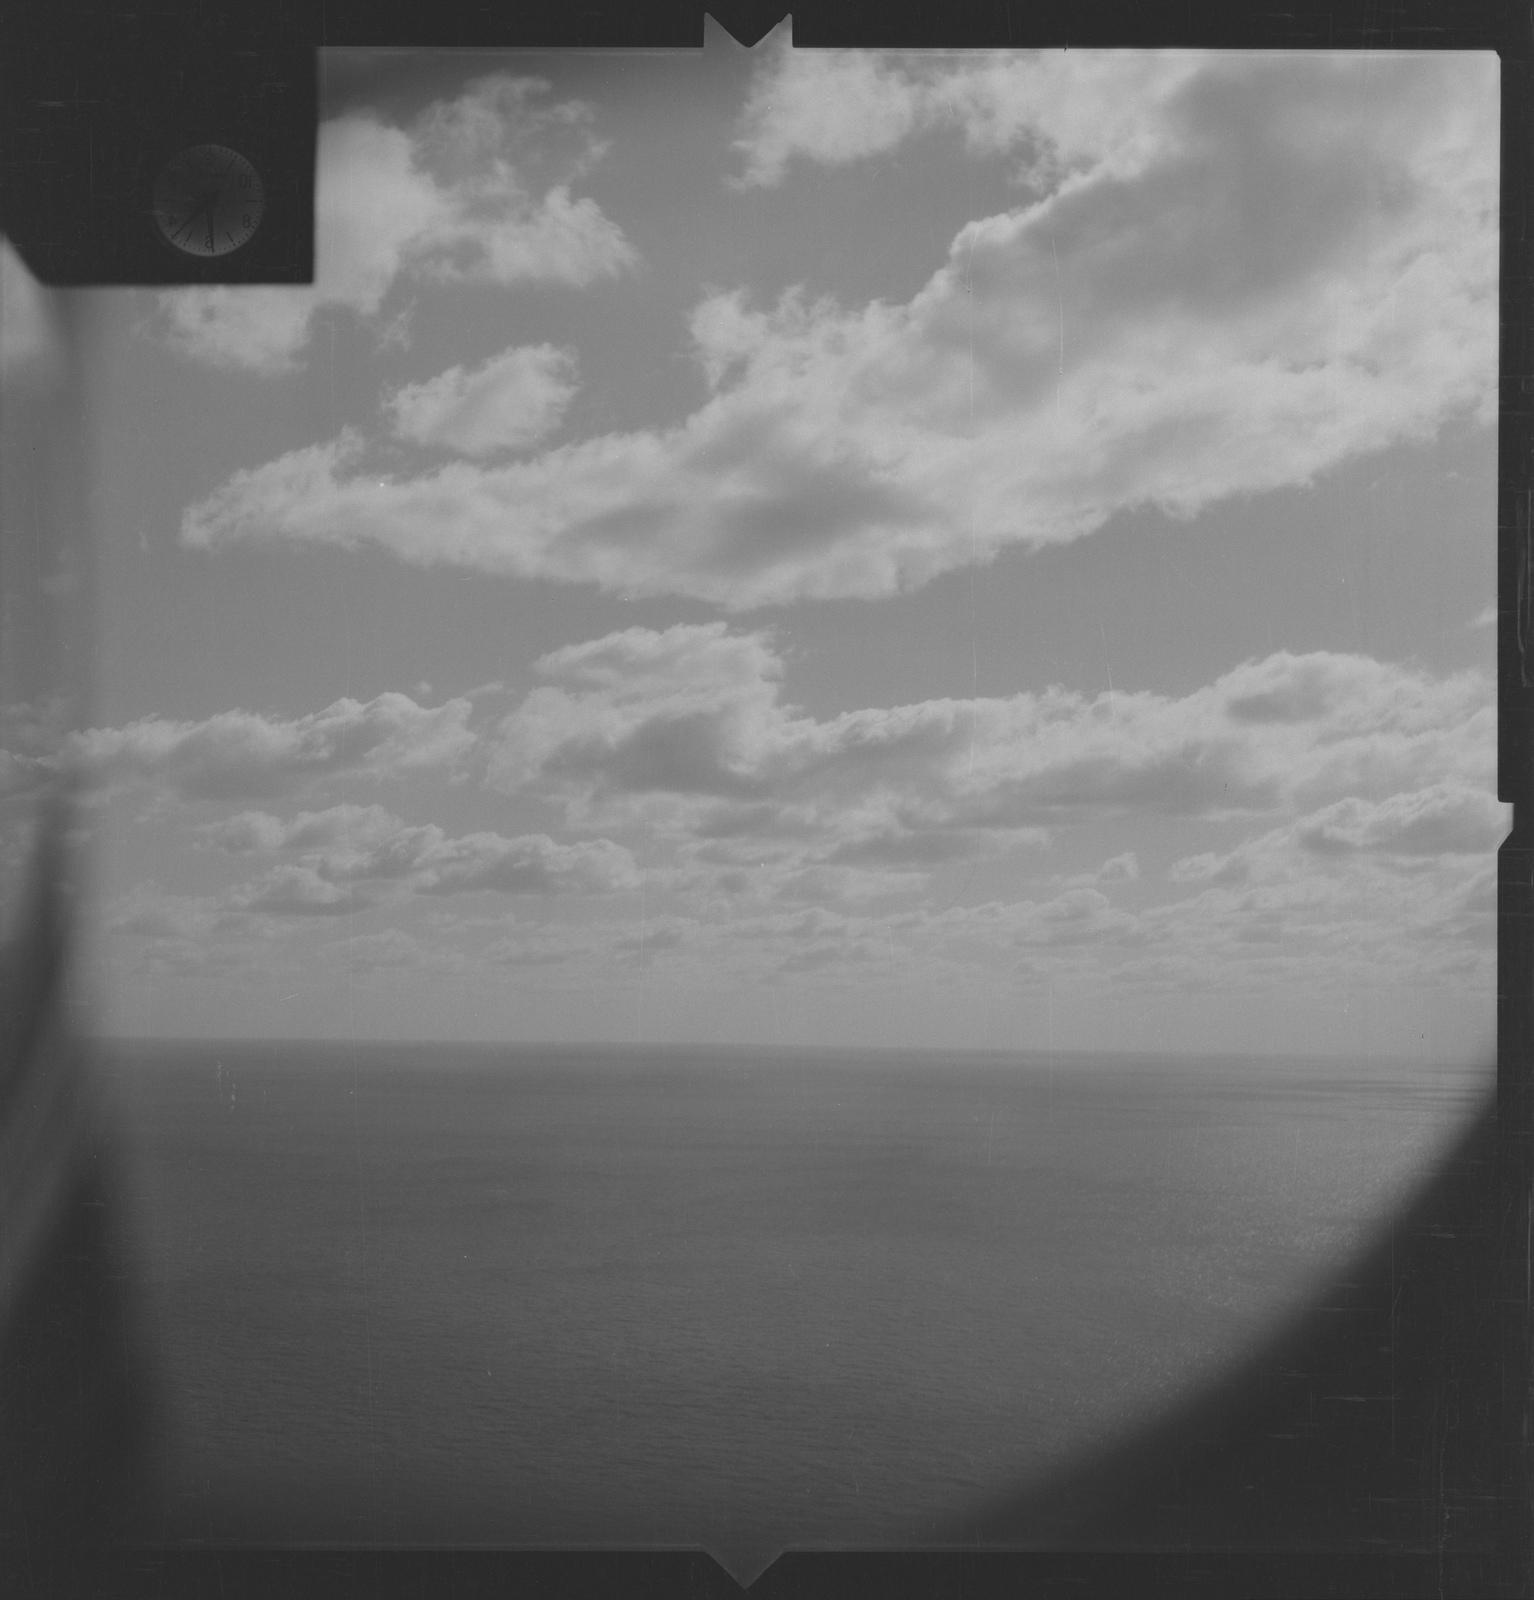 Mercury 1A Mission - Clouds